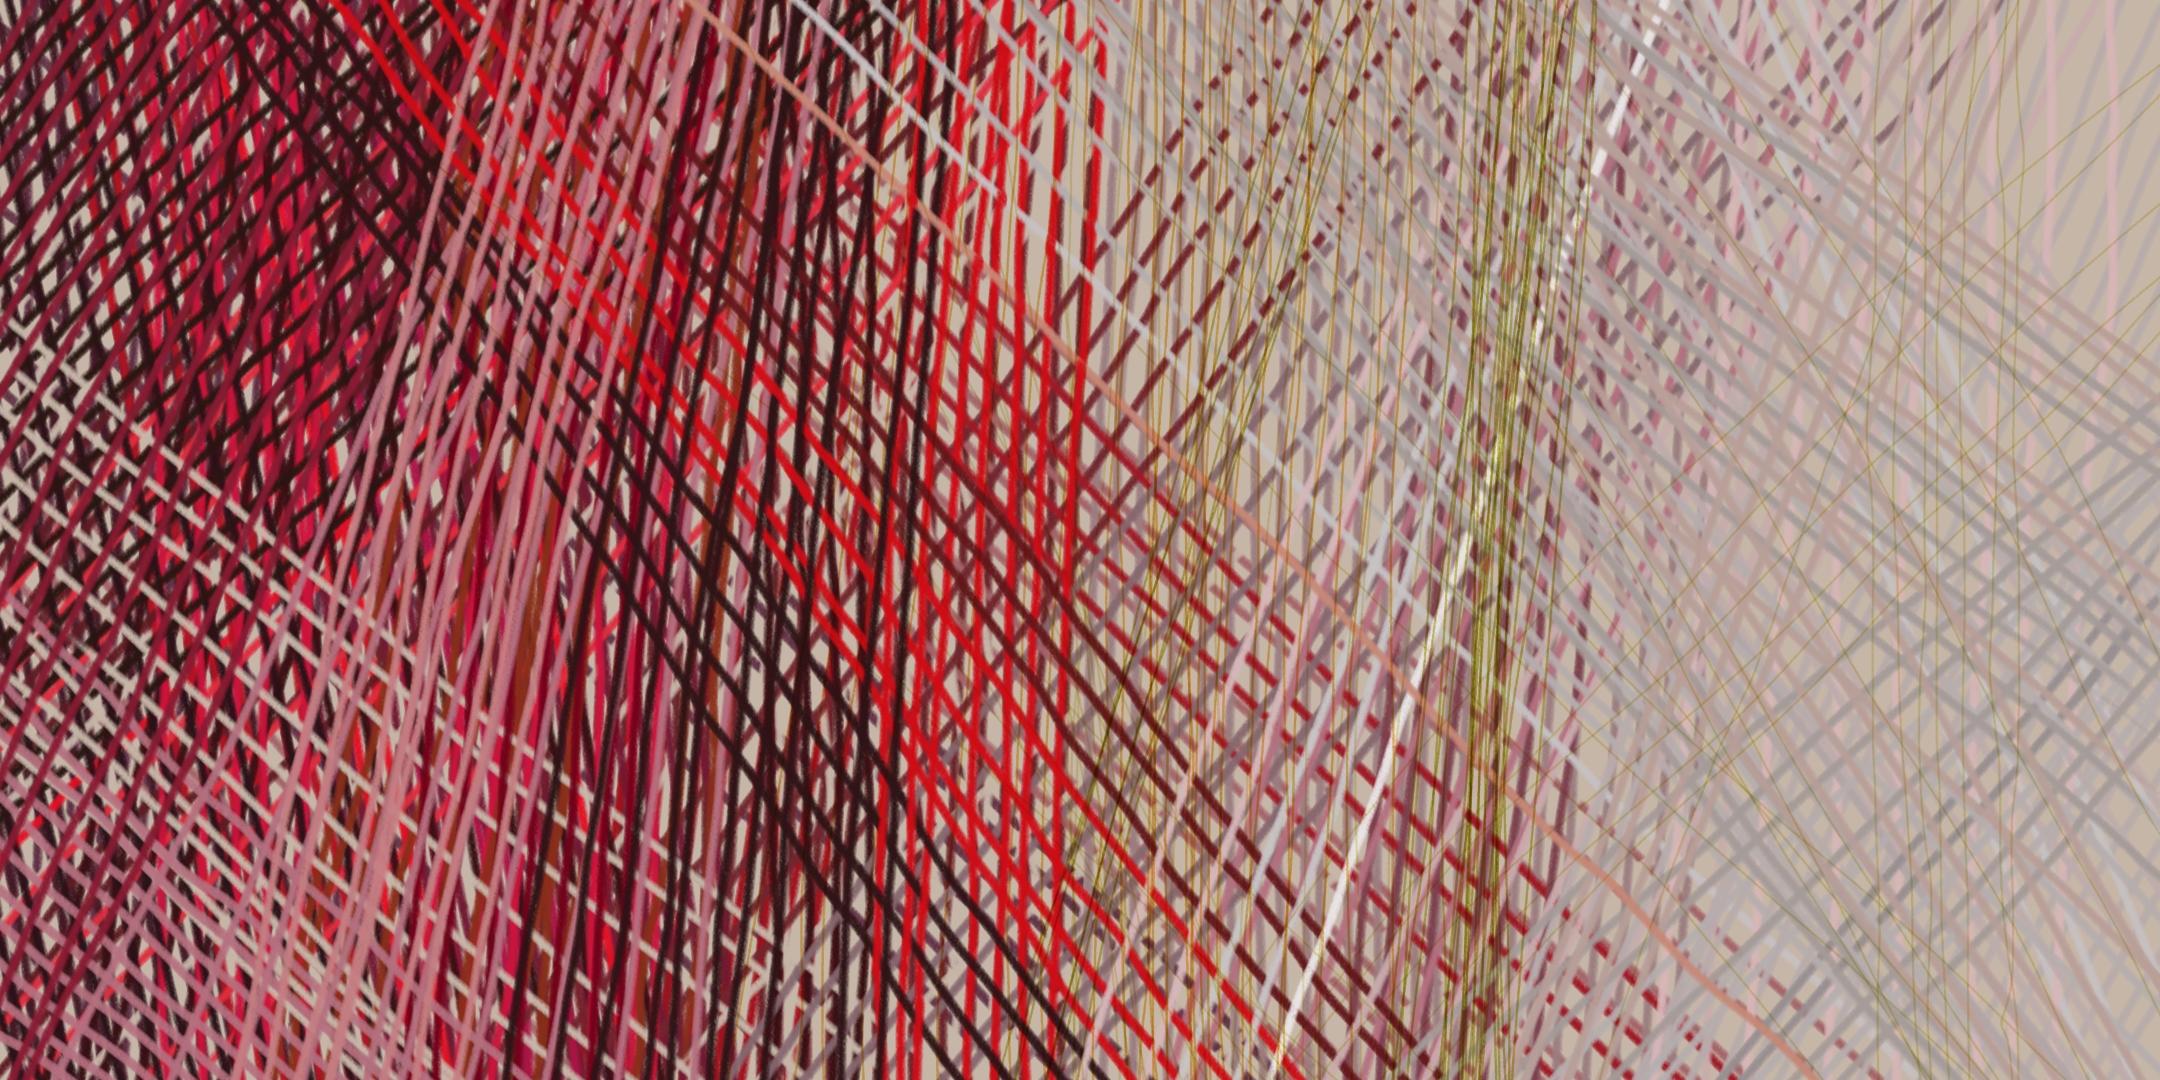 Line Texture Paint : Weaver series shamaferfraggy